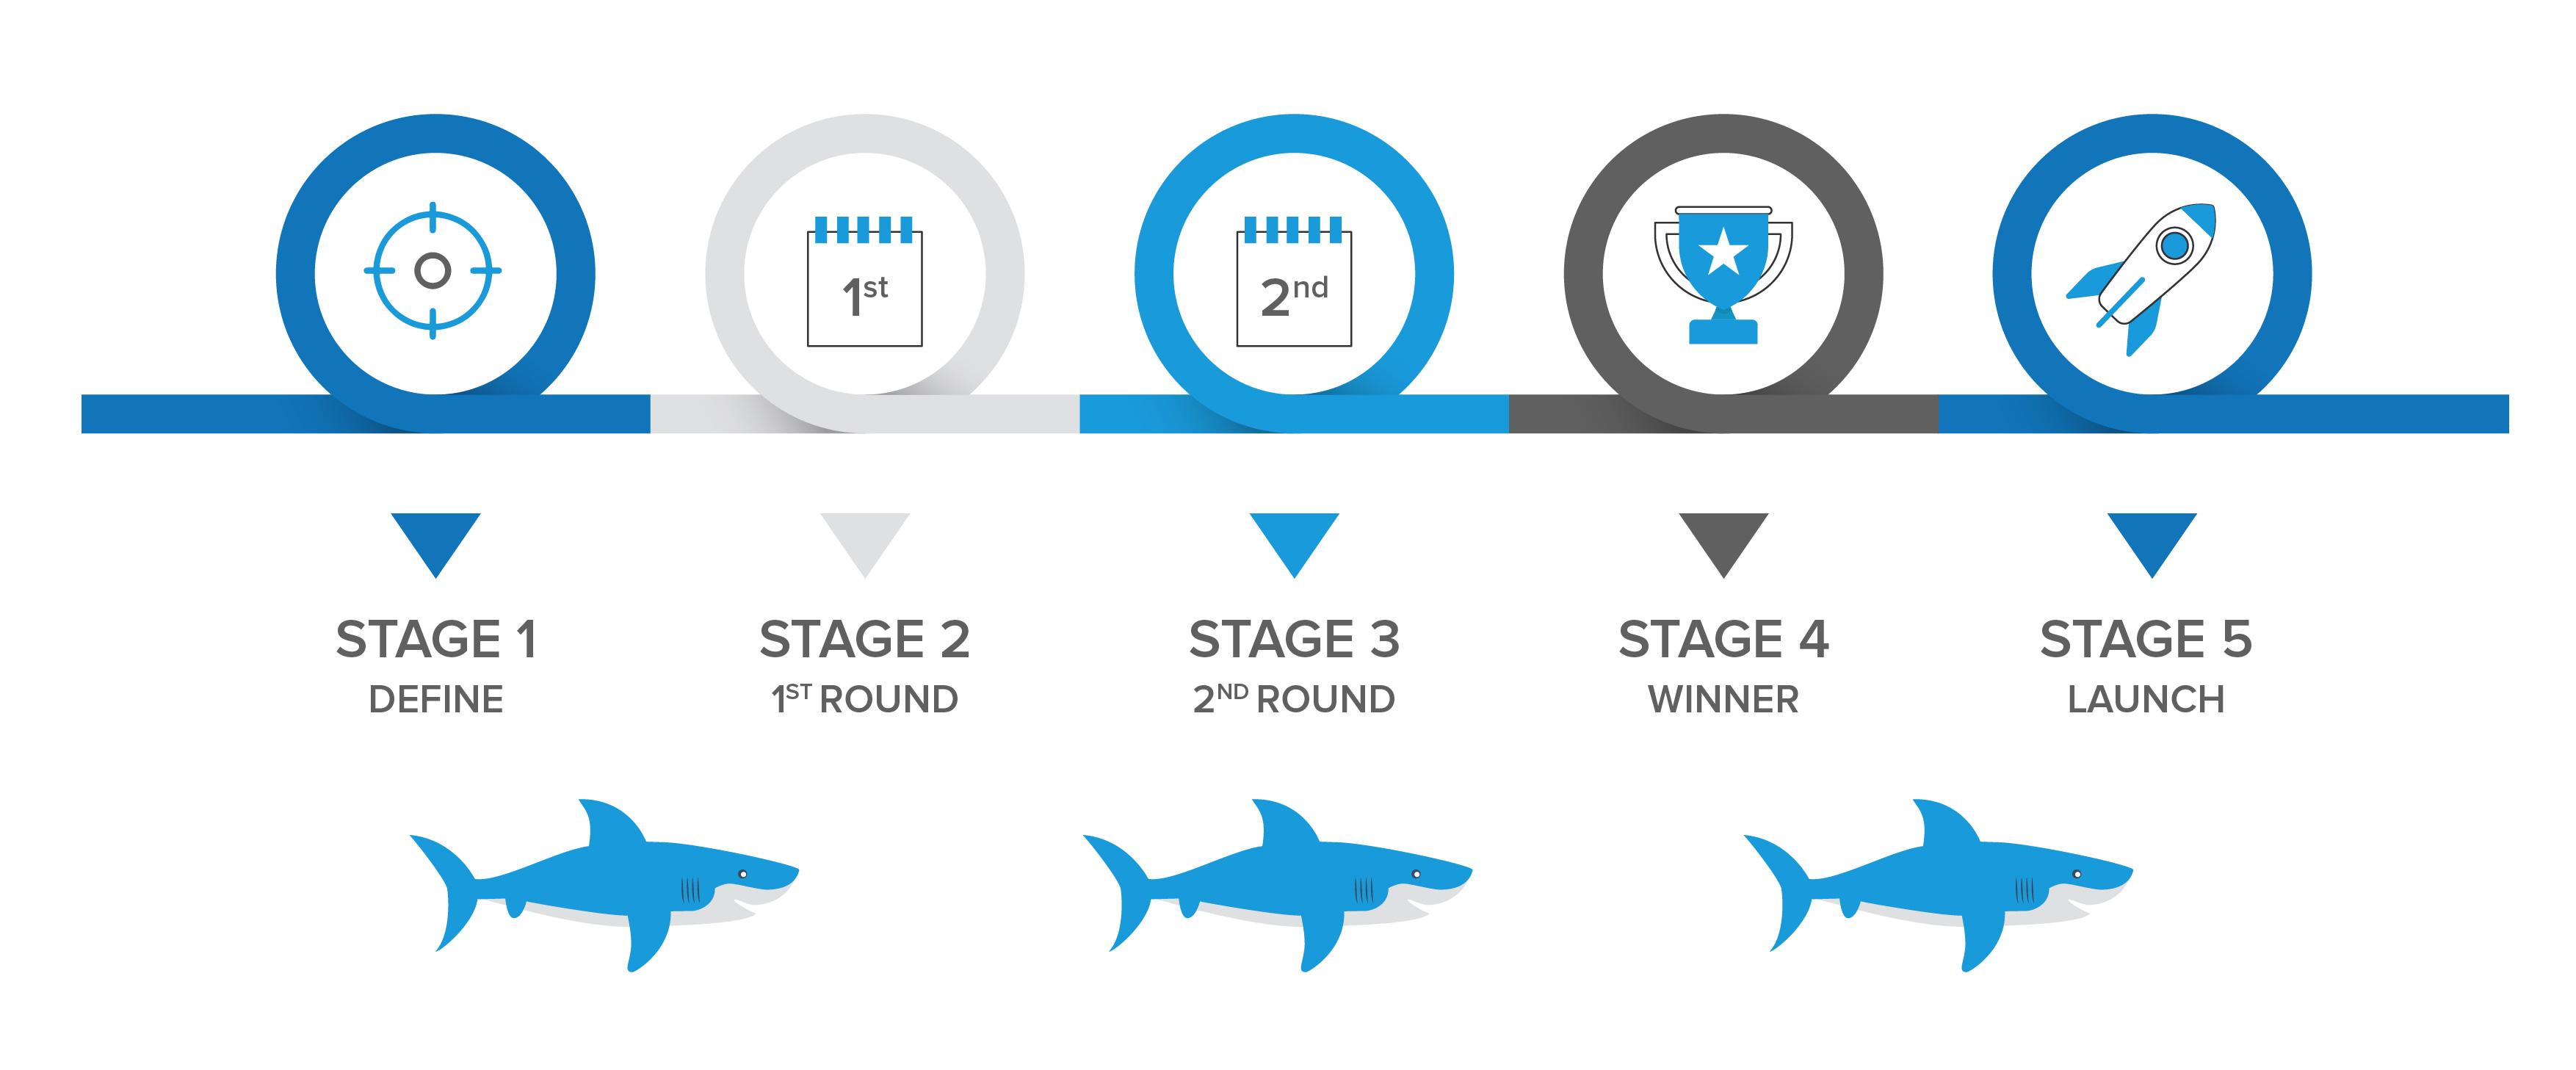 Shark Tank Business Competition Platform